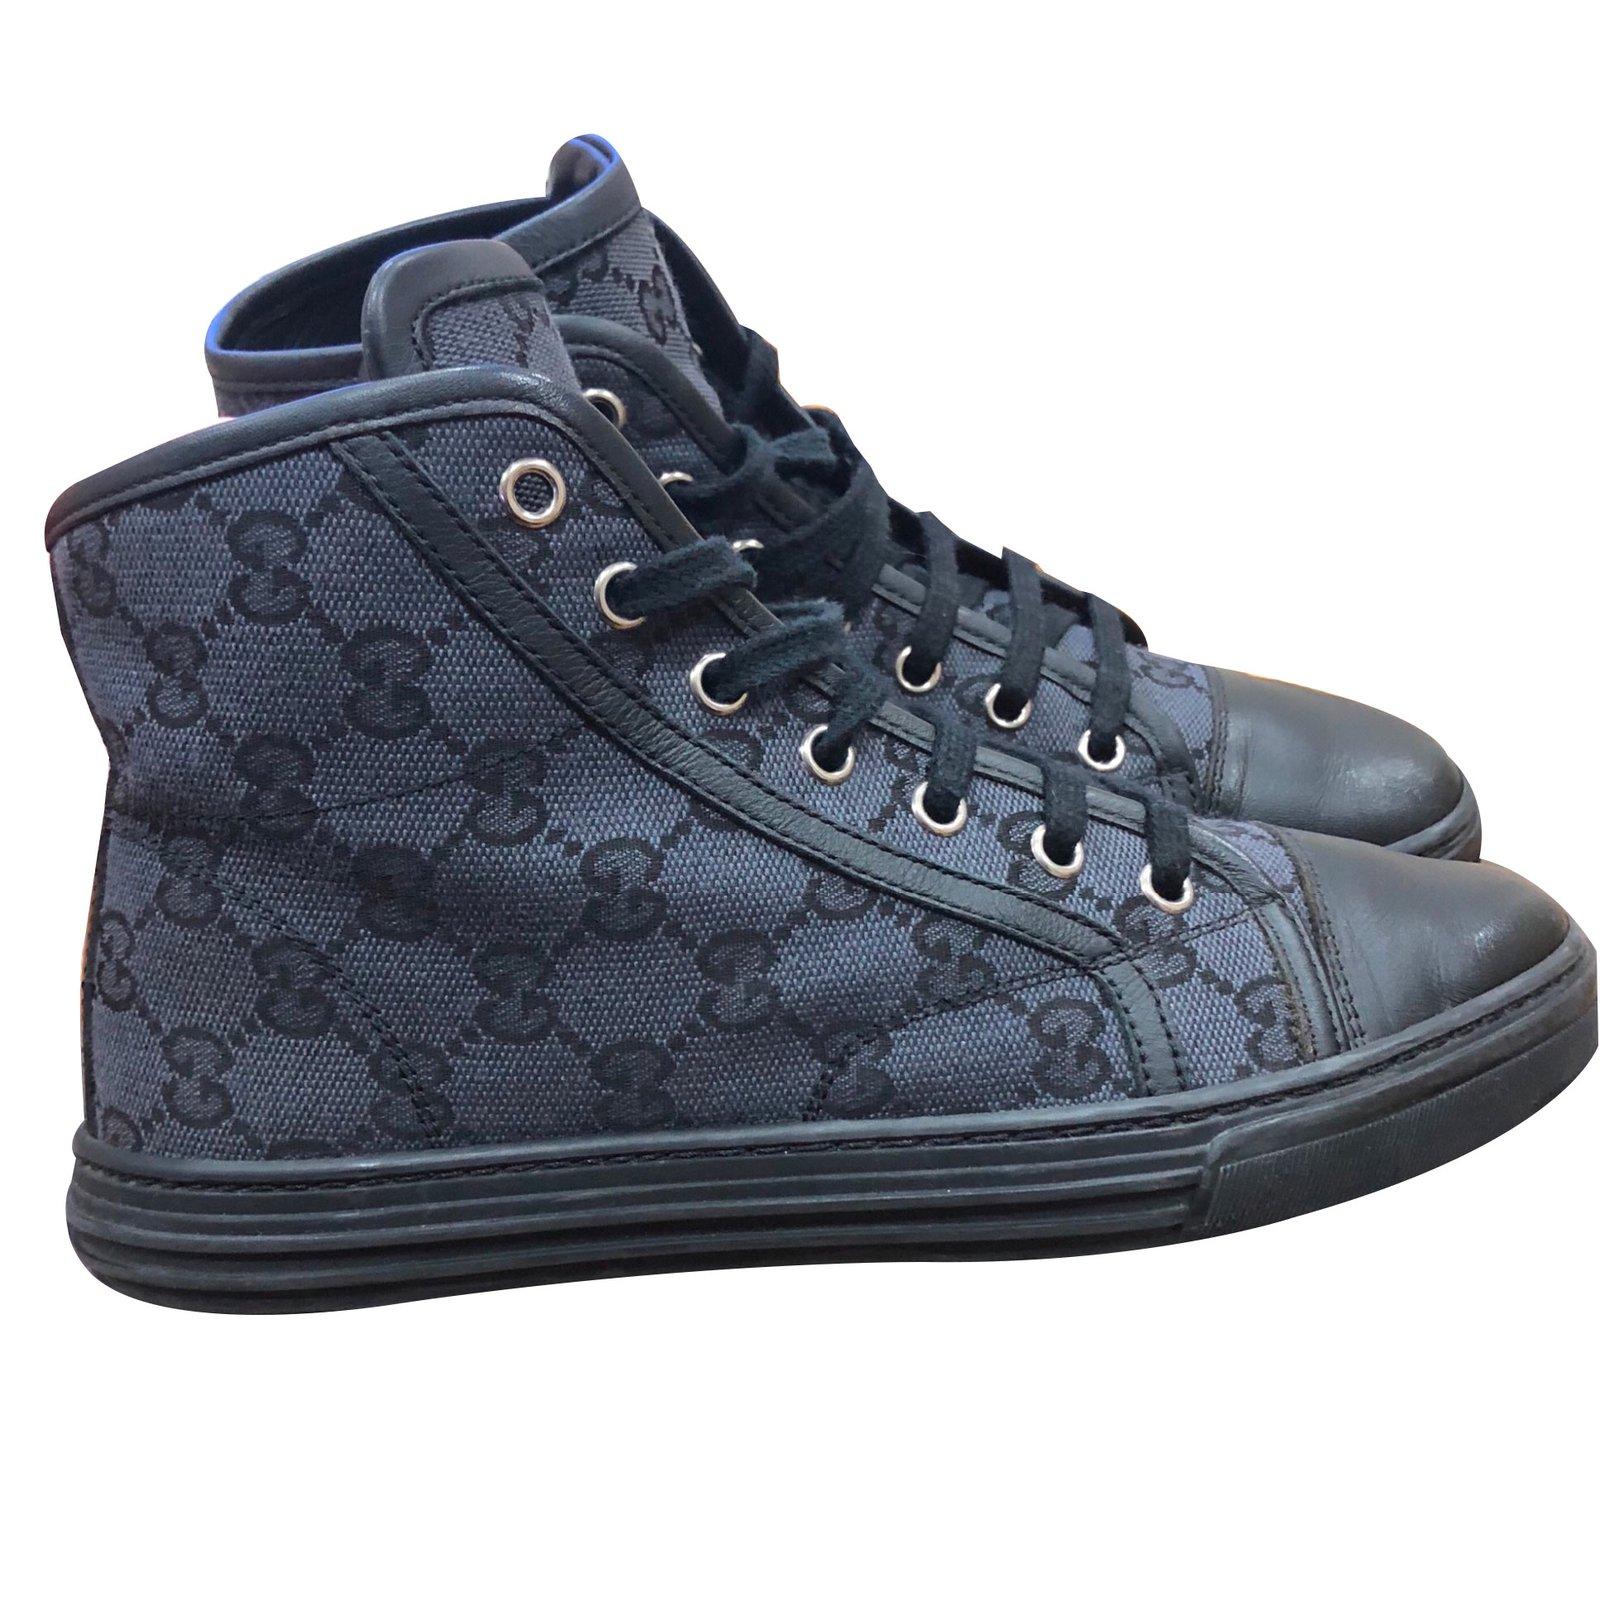 d8cabf4ce9c Gucci Hi top monogram trainers Sneakers Cloth Black ref.87369 - Joli ...